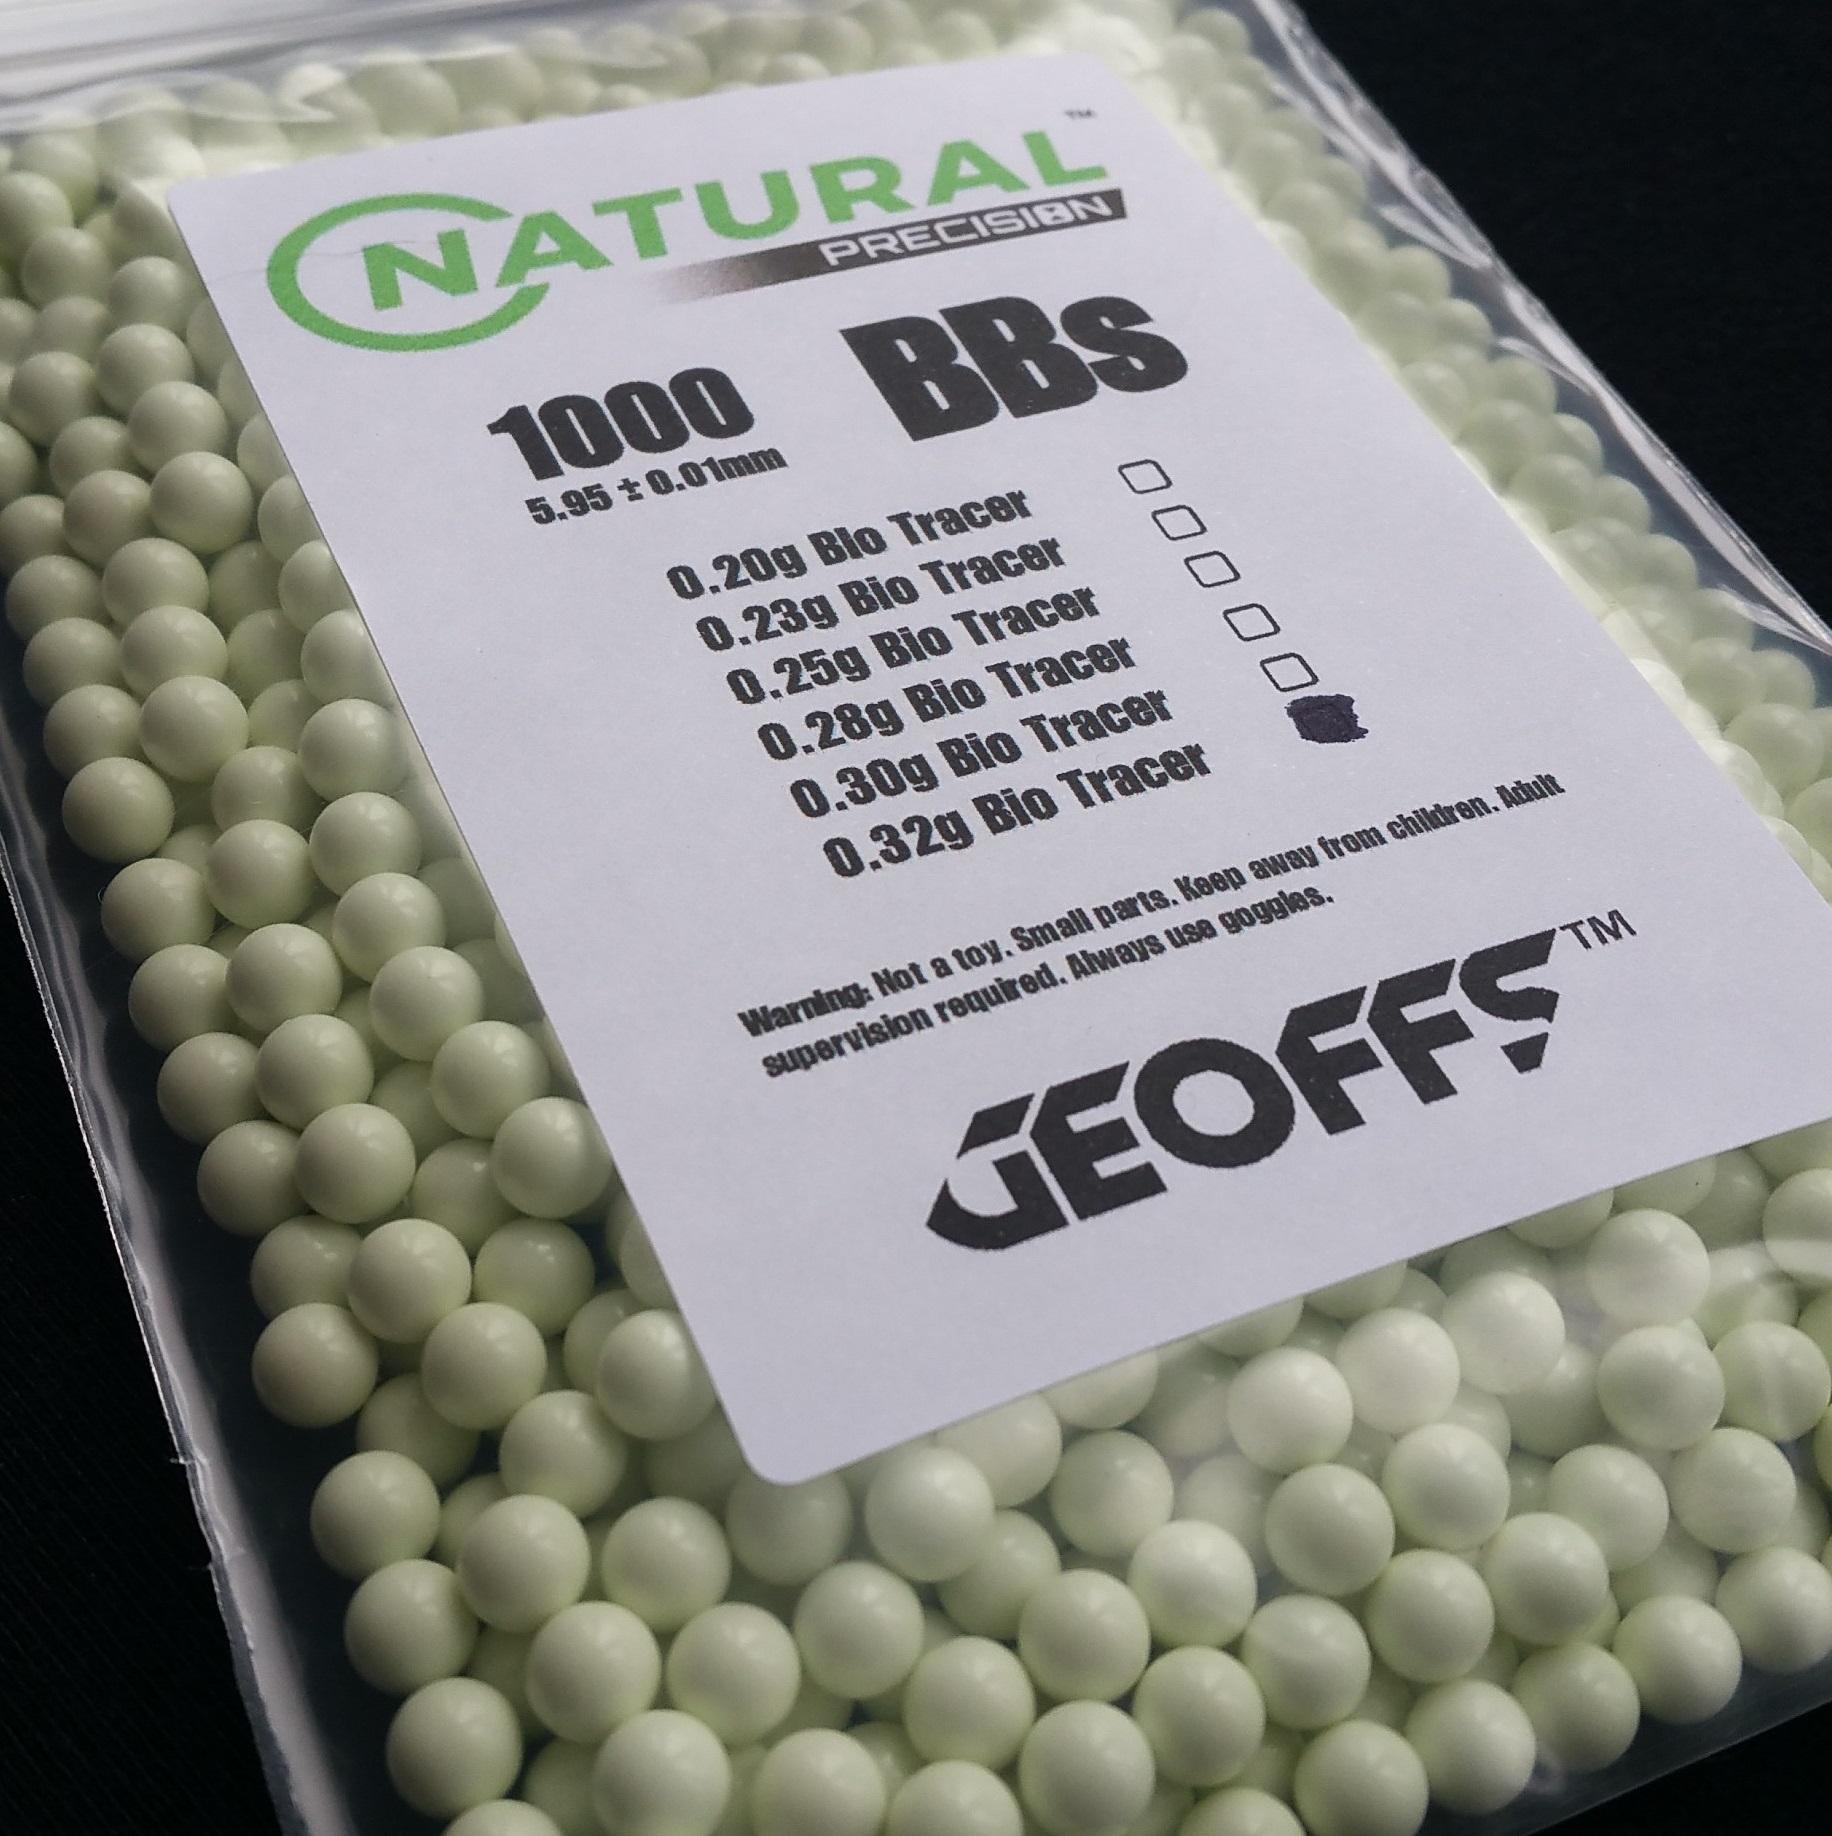 GEOFFS™ PRECISION™ AIRSOFT BBS 0.28g 3000rd